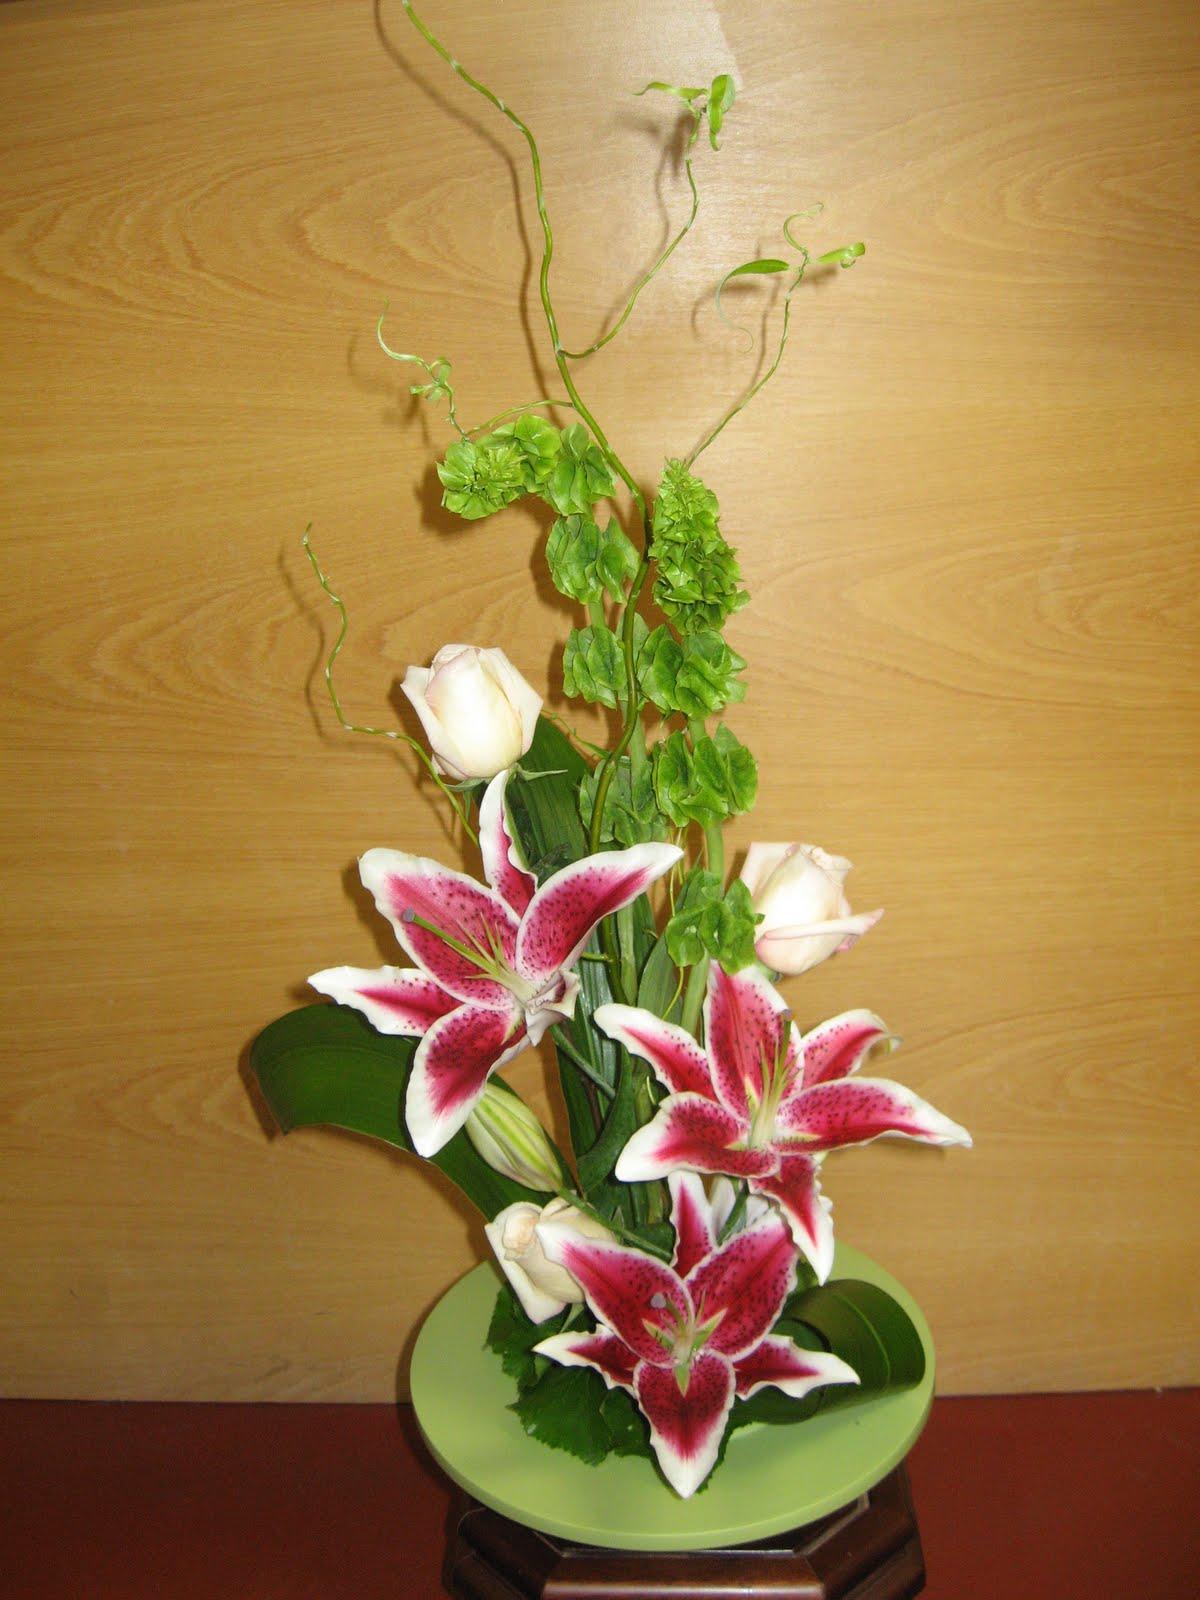 Let s learn japanese 日本語を勉強しましょう ikebana exquisite